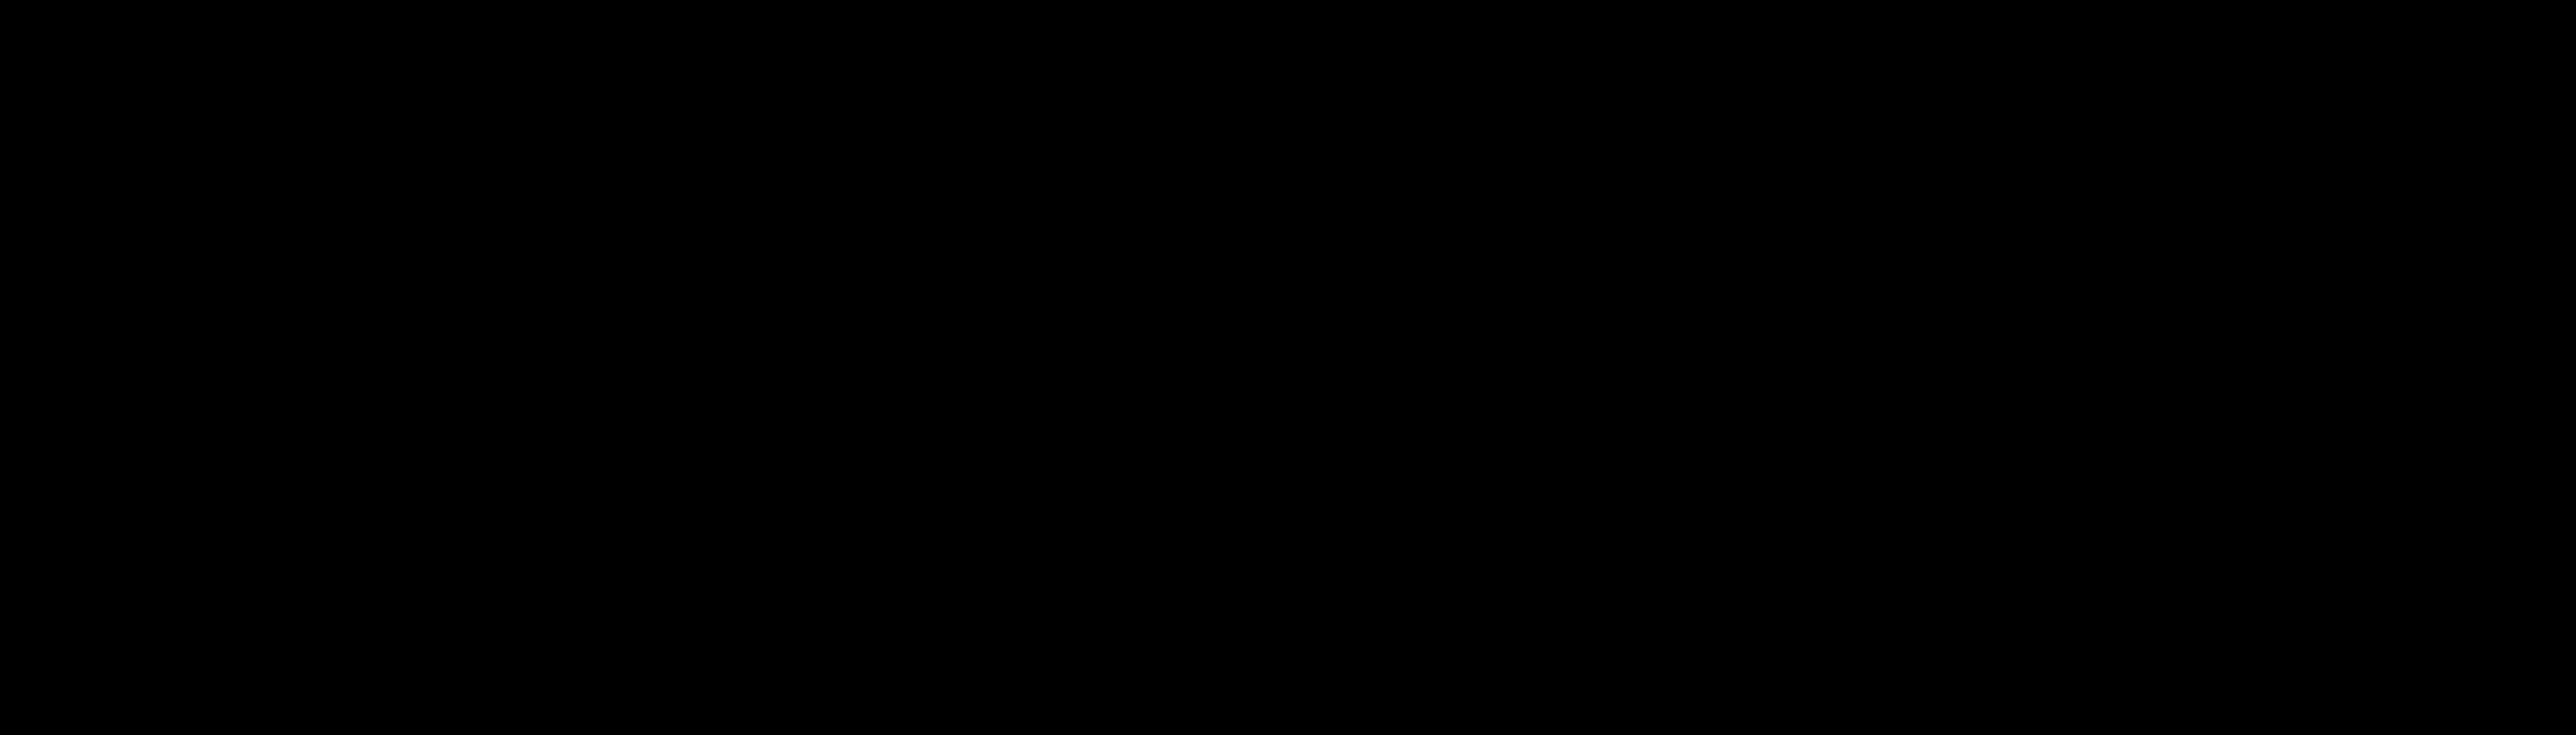 N-(6-Aminooxyacetamidohexyl)-biotinamide